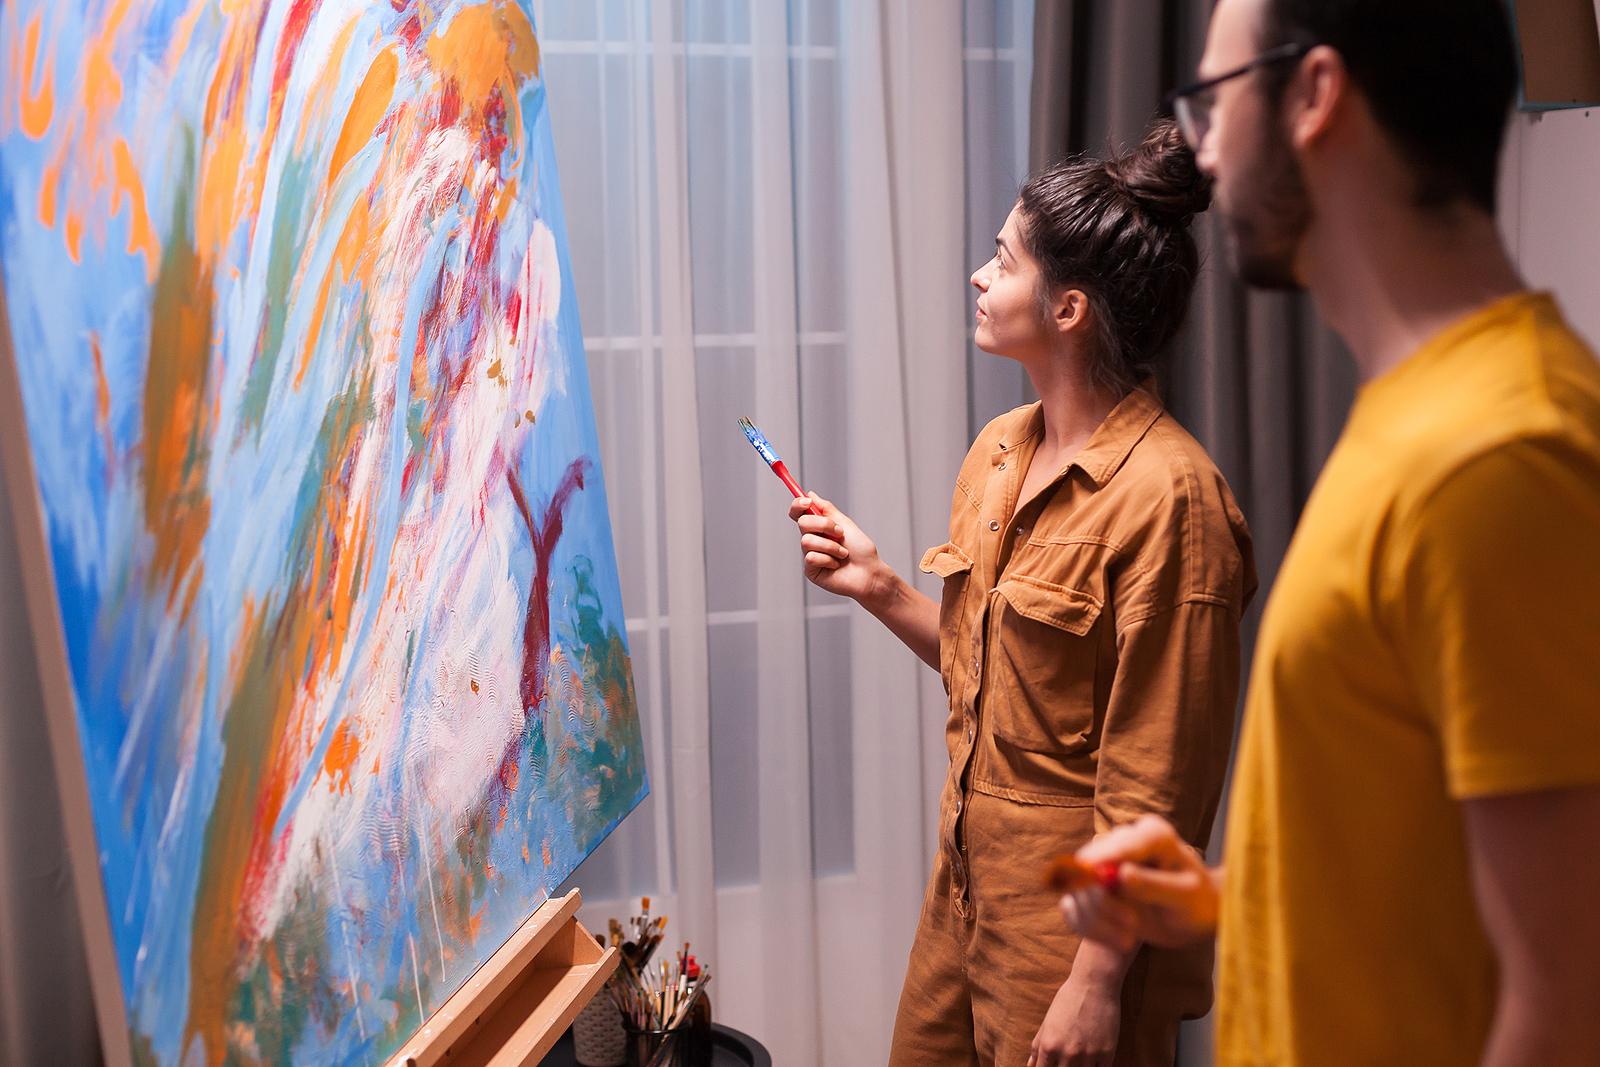 Top 5 Times You Need a FTop 5 Times You Need a Fine Art Moving Company